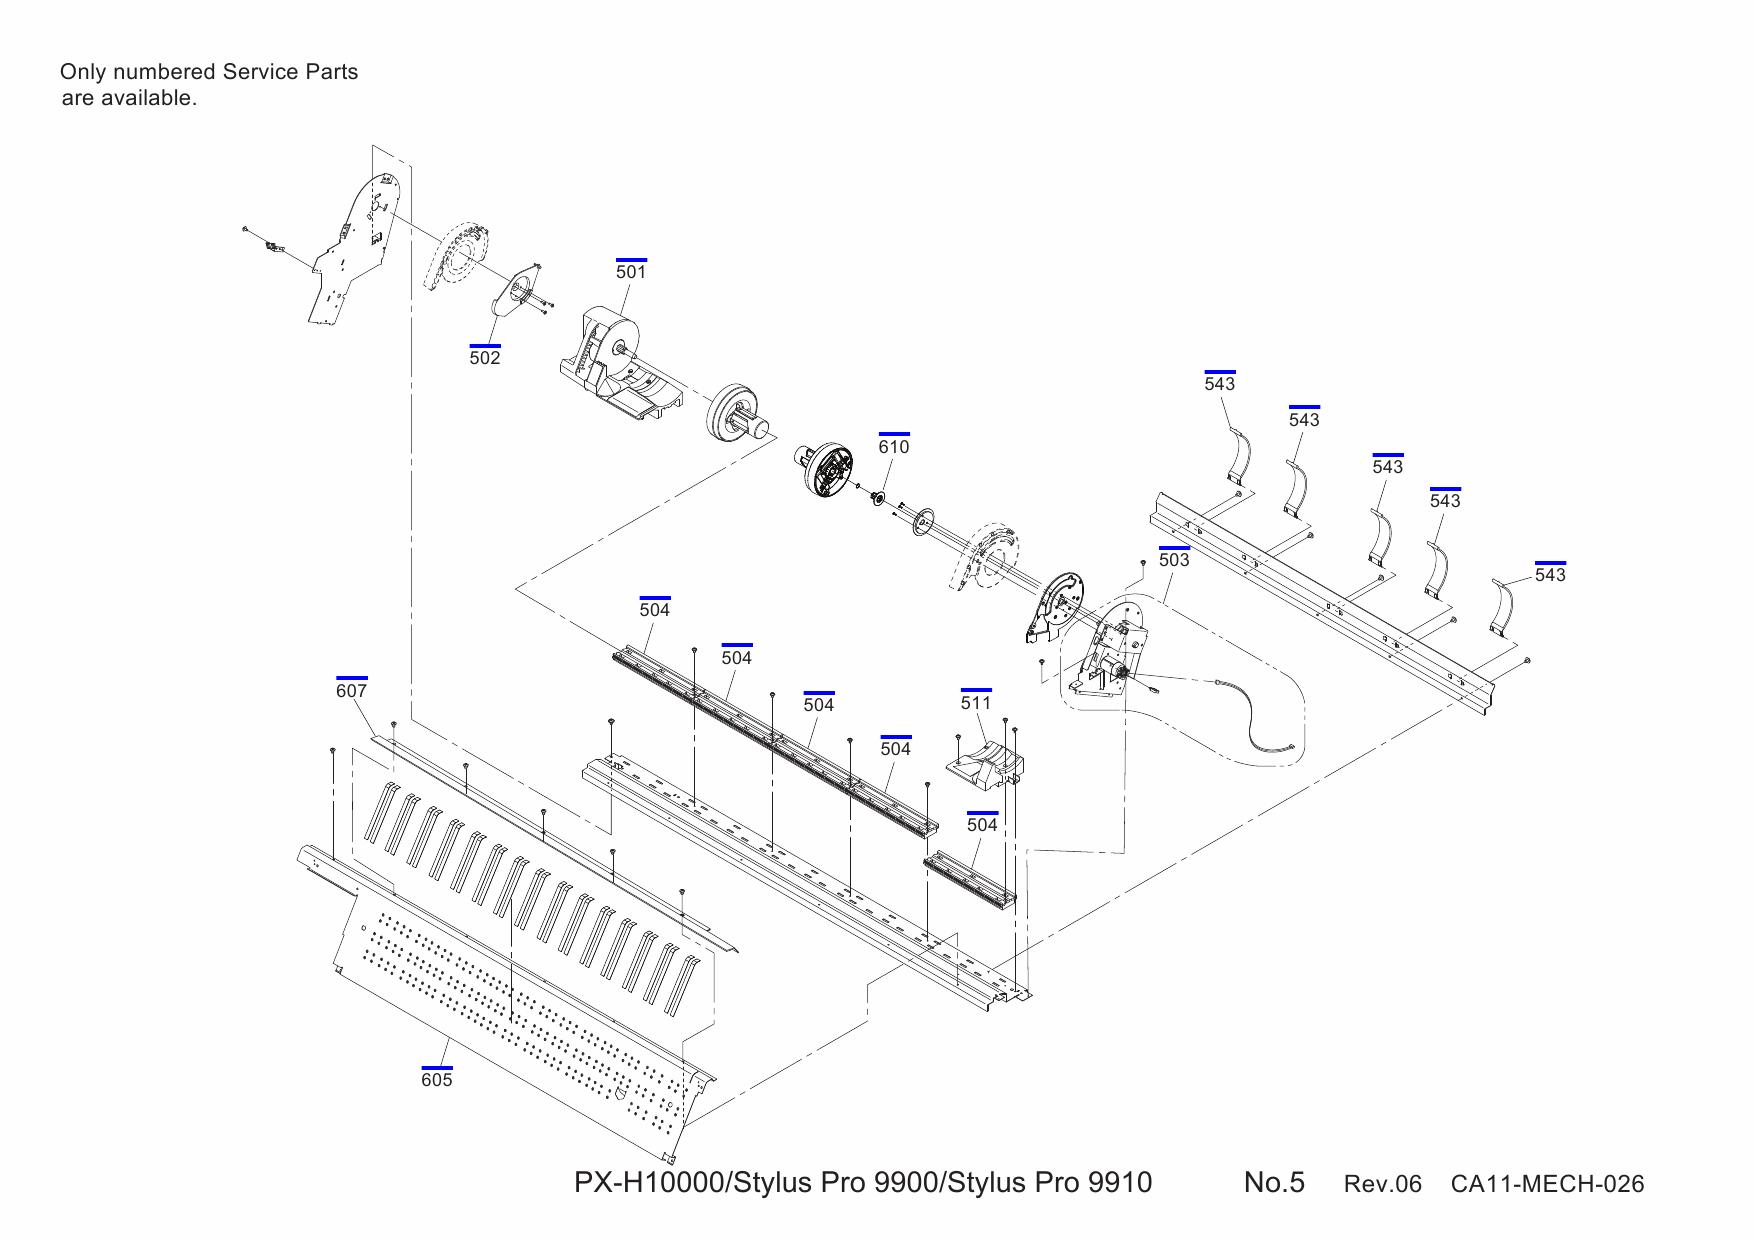 hight resolution of chevy 454 rv engine diagram engine diagram and wiring chevy 454 motor for motorhome chevy 454 engine belt diagram